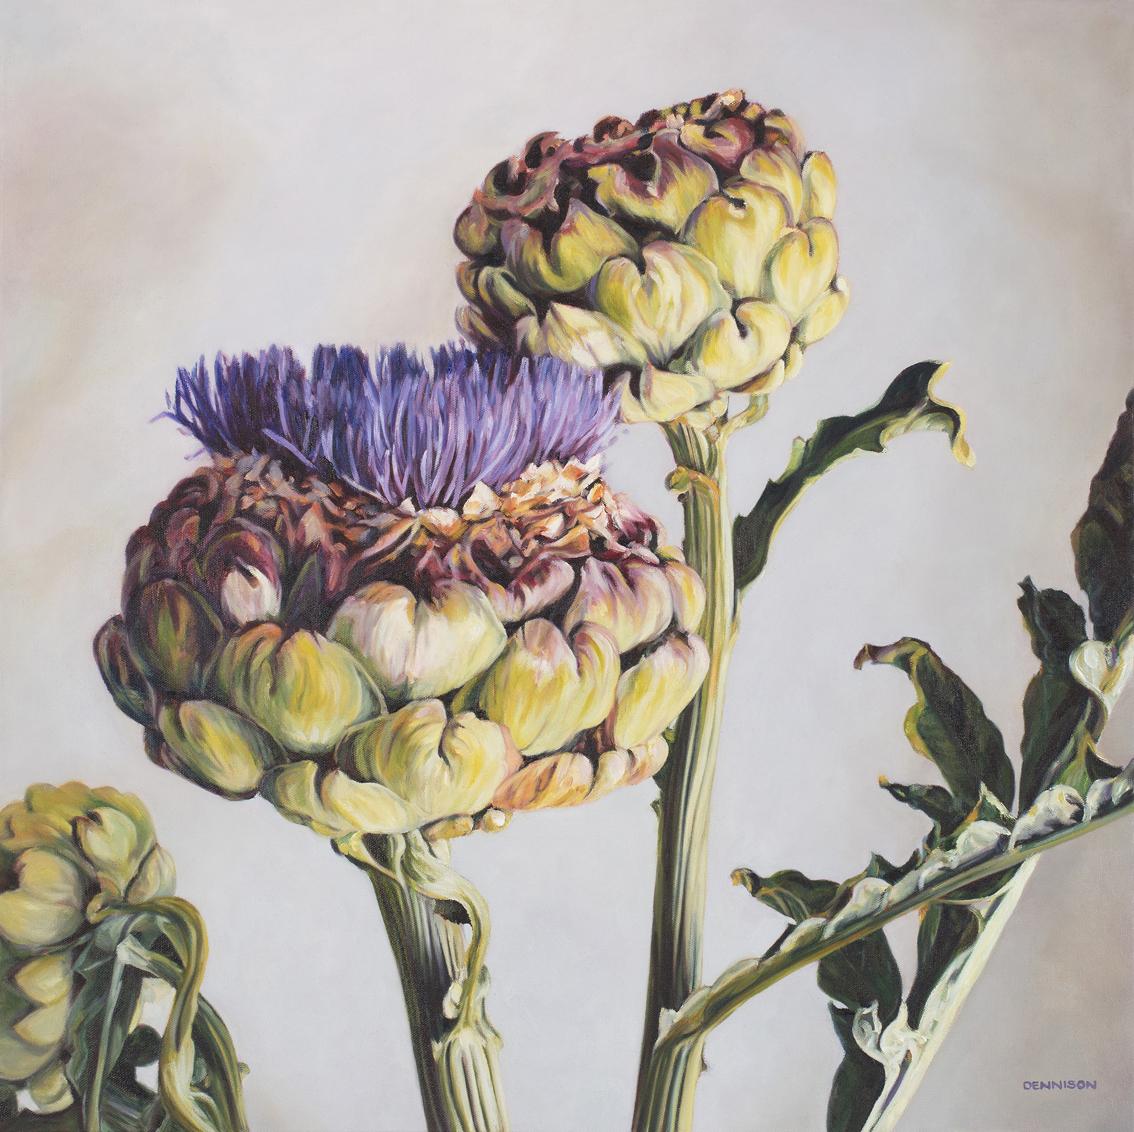 Artichokes from the Garden   Oil on Canvas, 71cm x 71cm